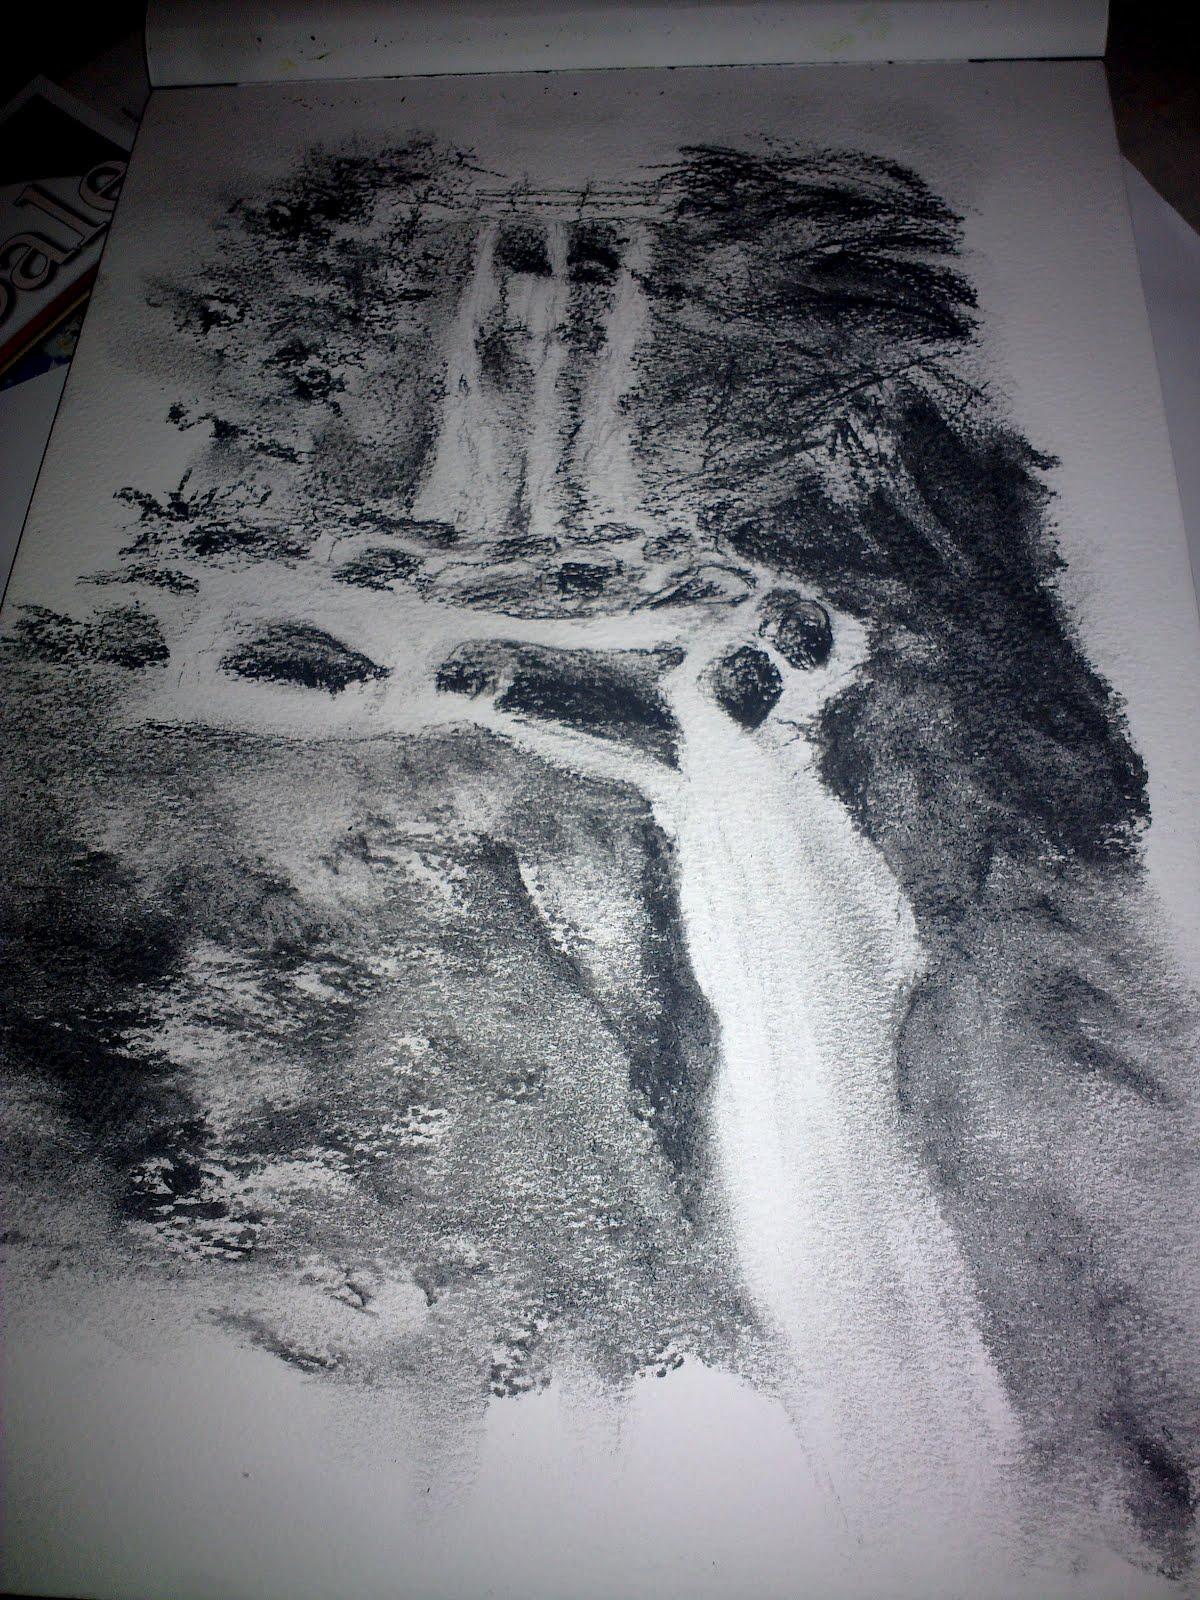 Candy hamilton craig pencil drawing of a waterfall